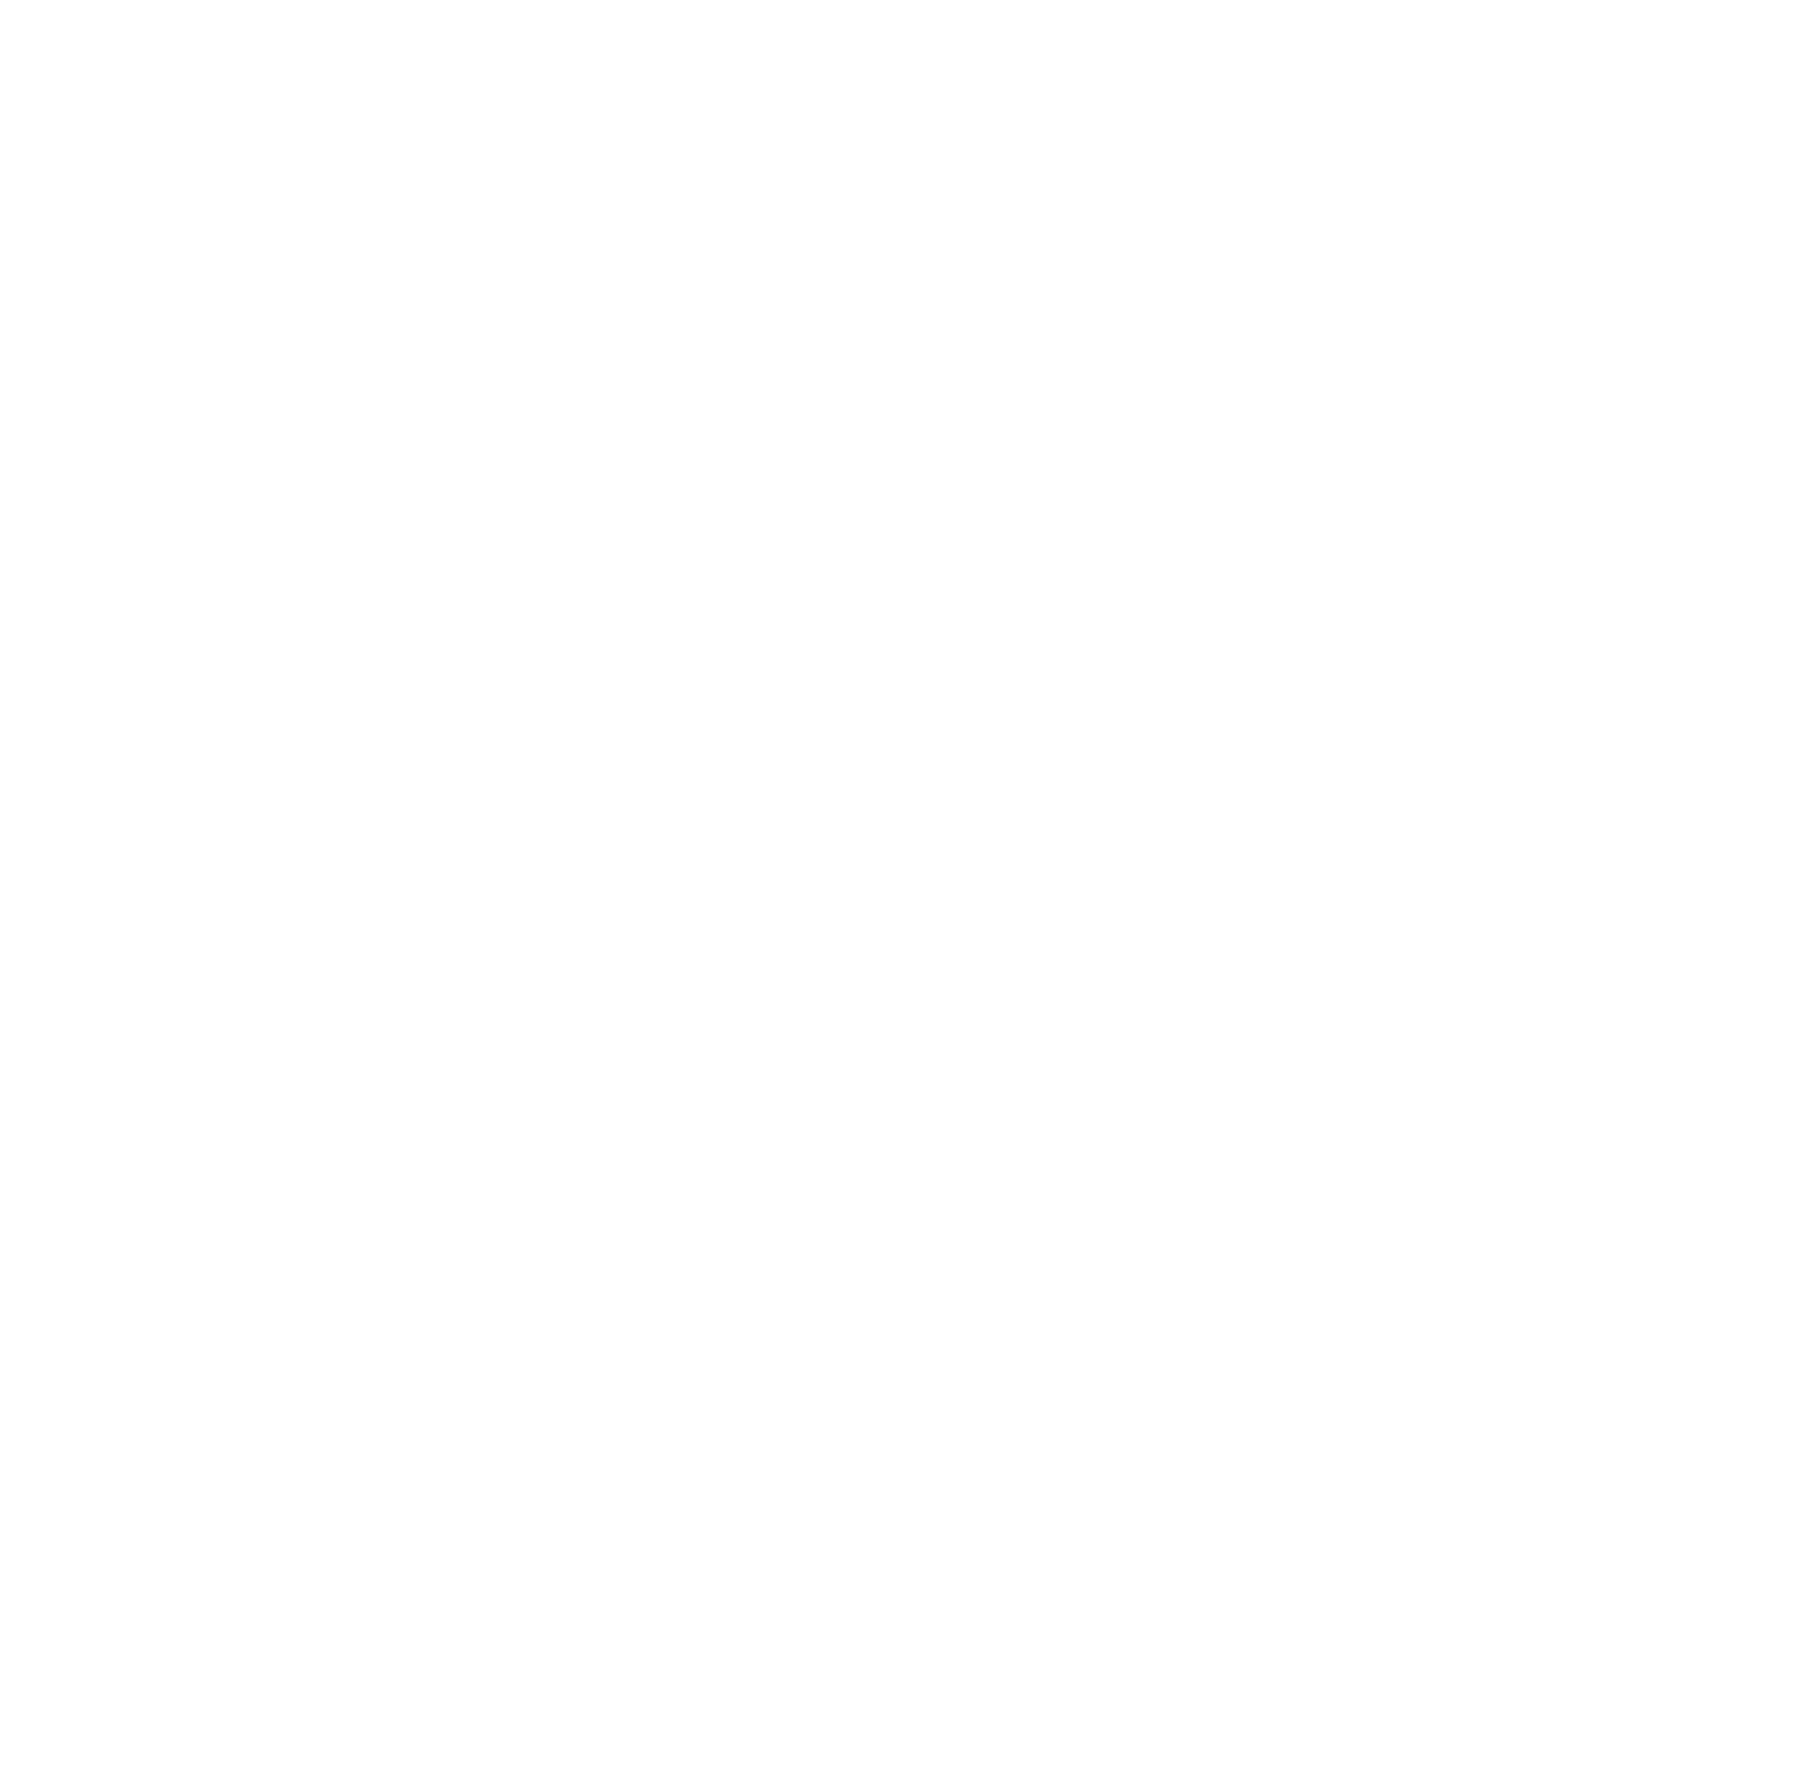 49th State, 49th State Brewing, 49th State Brewery, 49th State Brewing Co, 49th State Brewing Company, Denali, Denali Park, Denali National Park, DNP, Denali brewery, Denali brewpub, Denali restaurant, Alaska restaurant, Alaska brewery, salmon bake